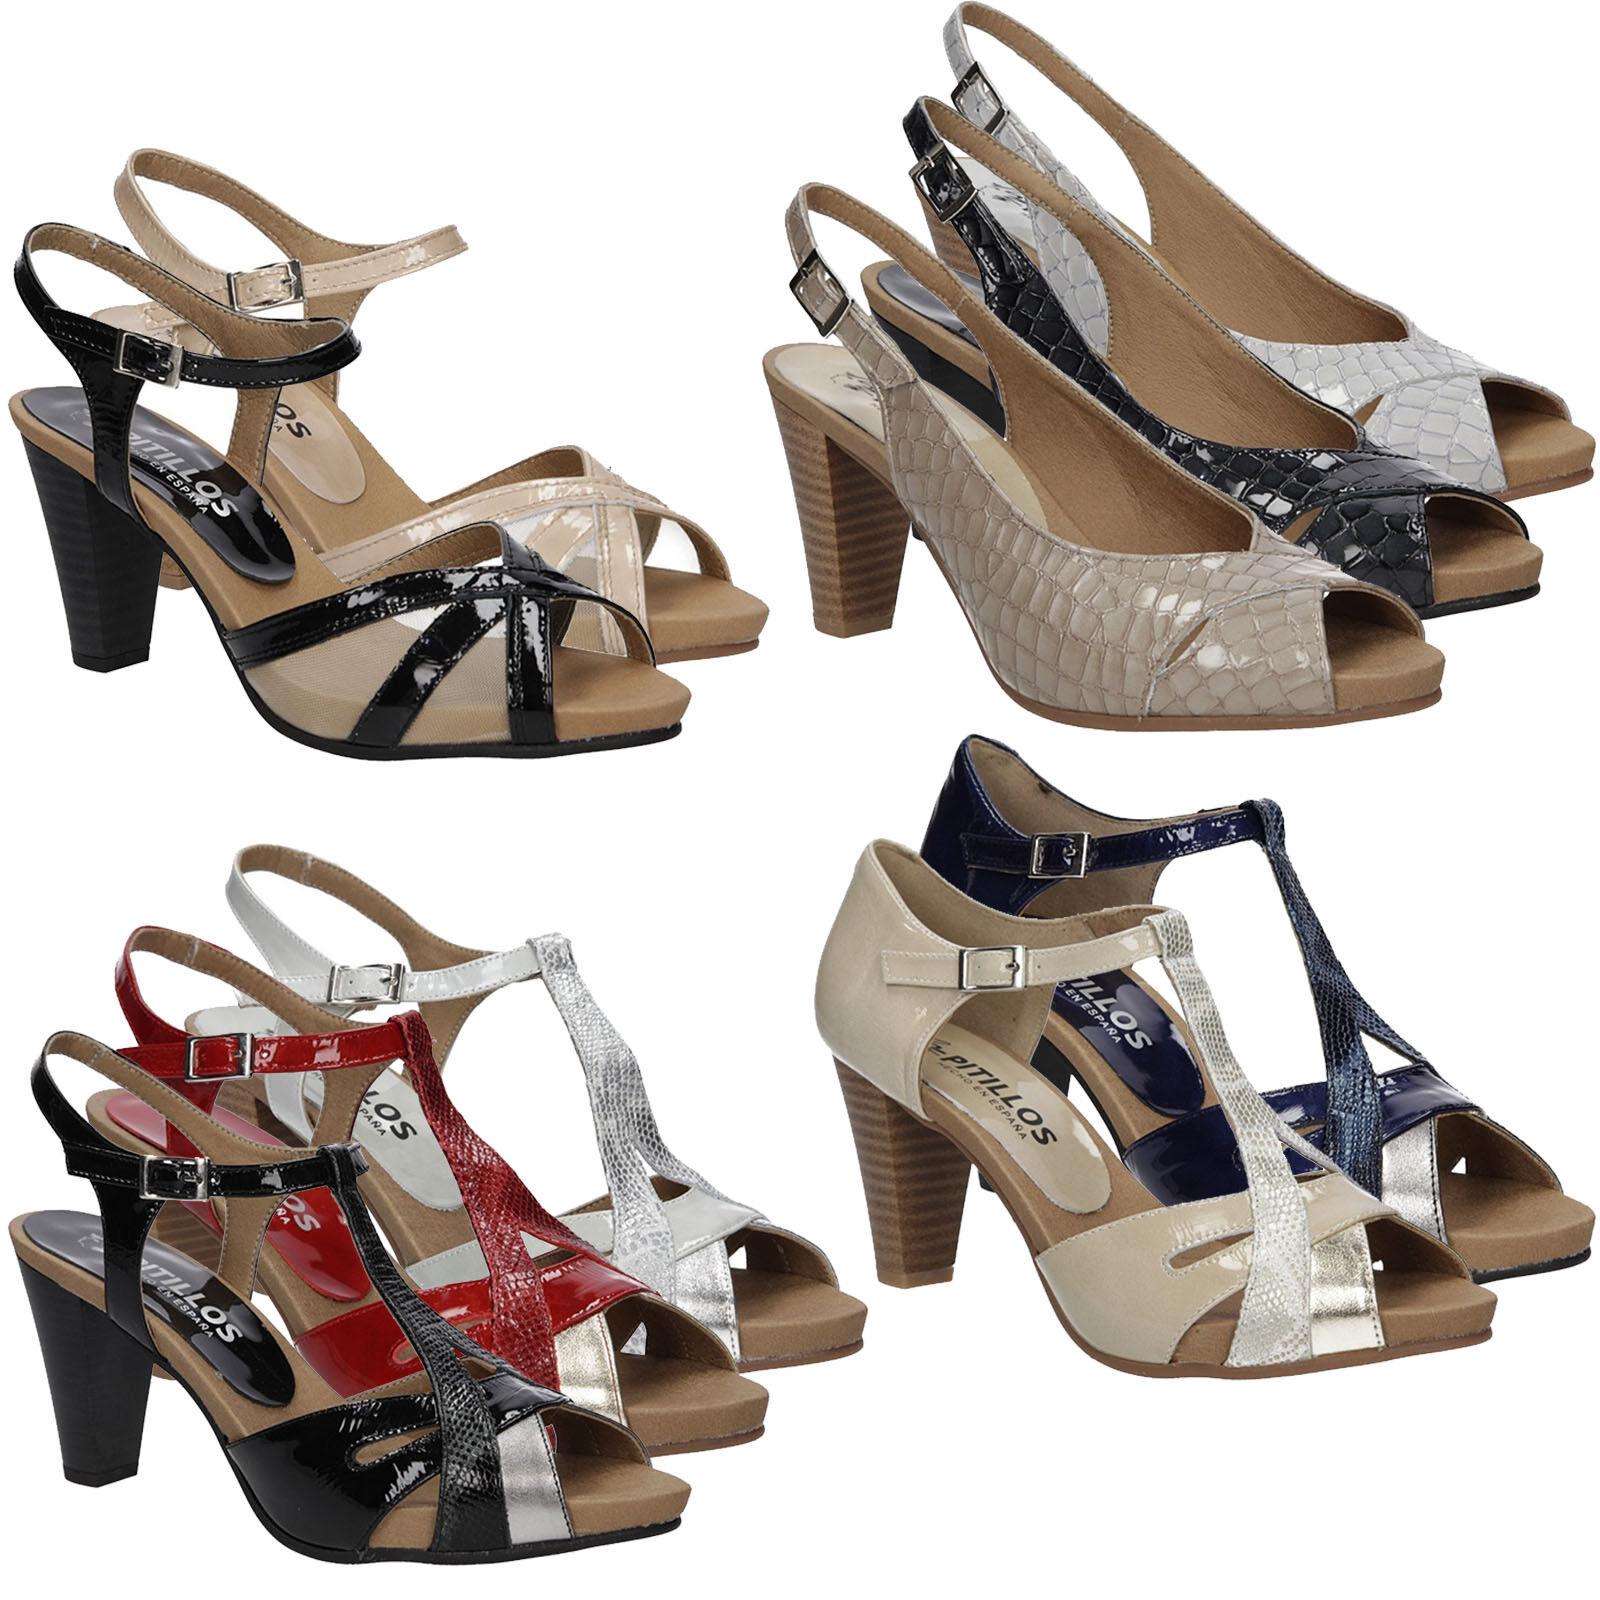 Damen Sandaletten Pitillos Echtleder Blockabsatz Blockabsatz Blockabsatz Elegant Sommer Gr. 35-41 NEU fcc091